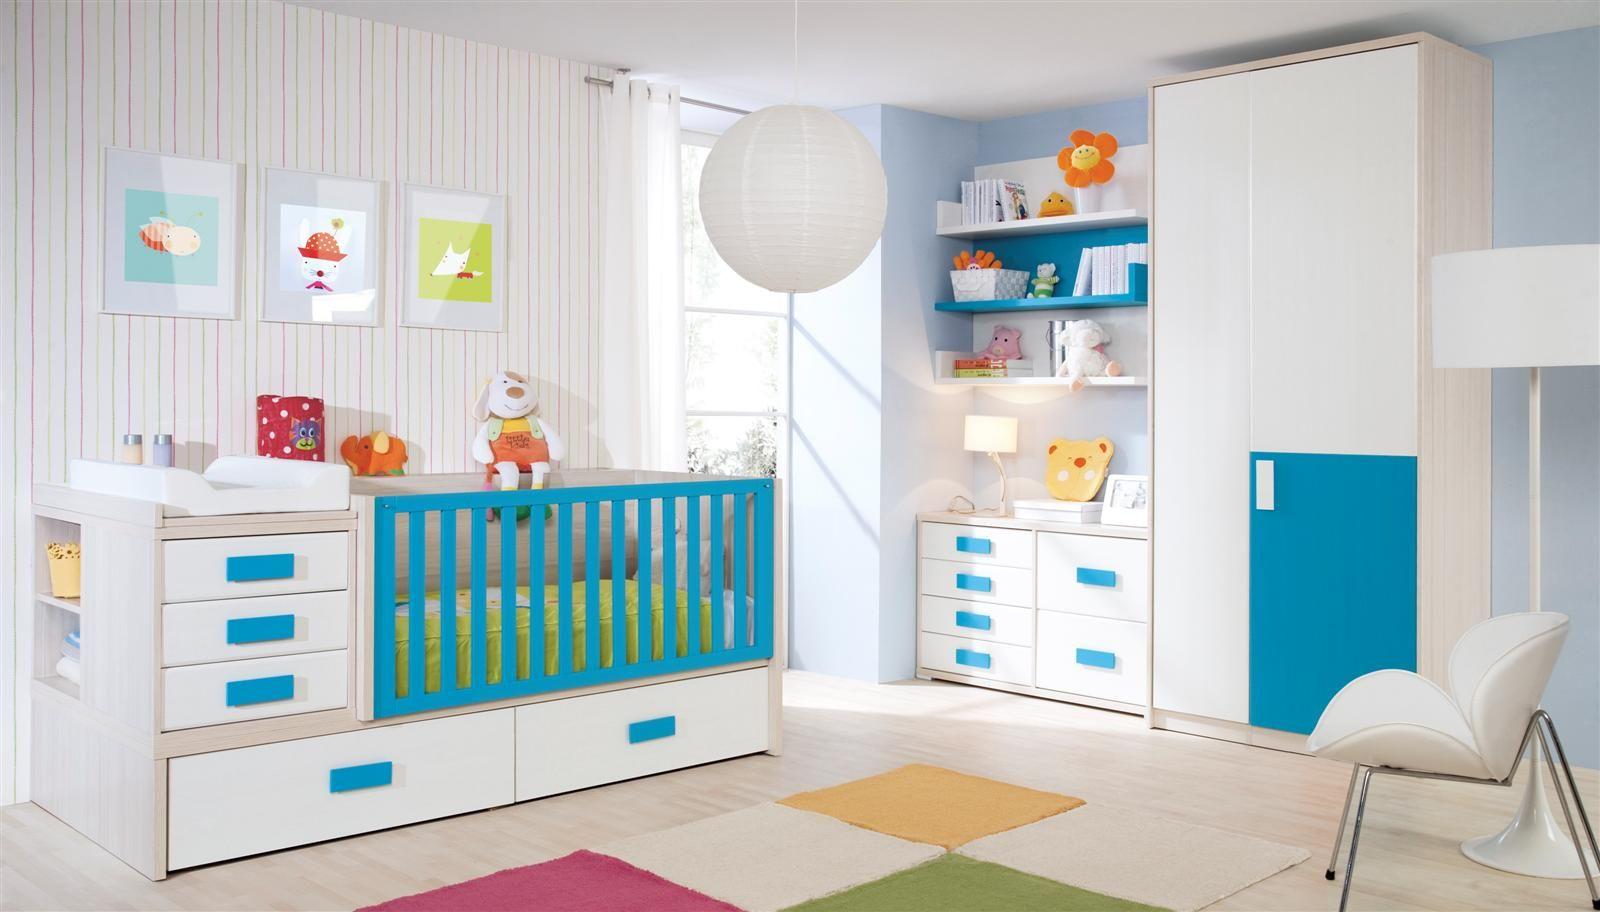 Cunas convertibles petit industria - Habitaciones de bebe convertibles ...